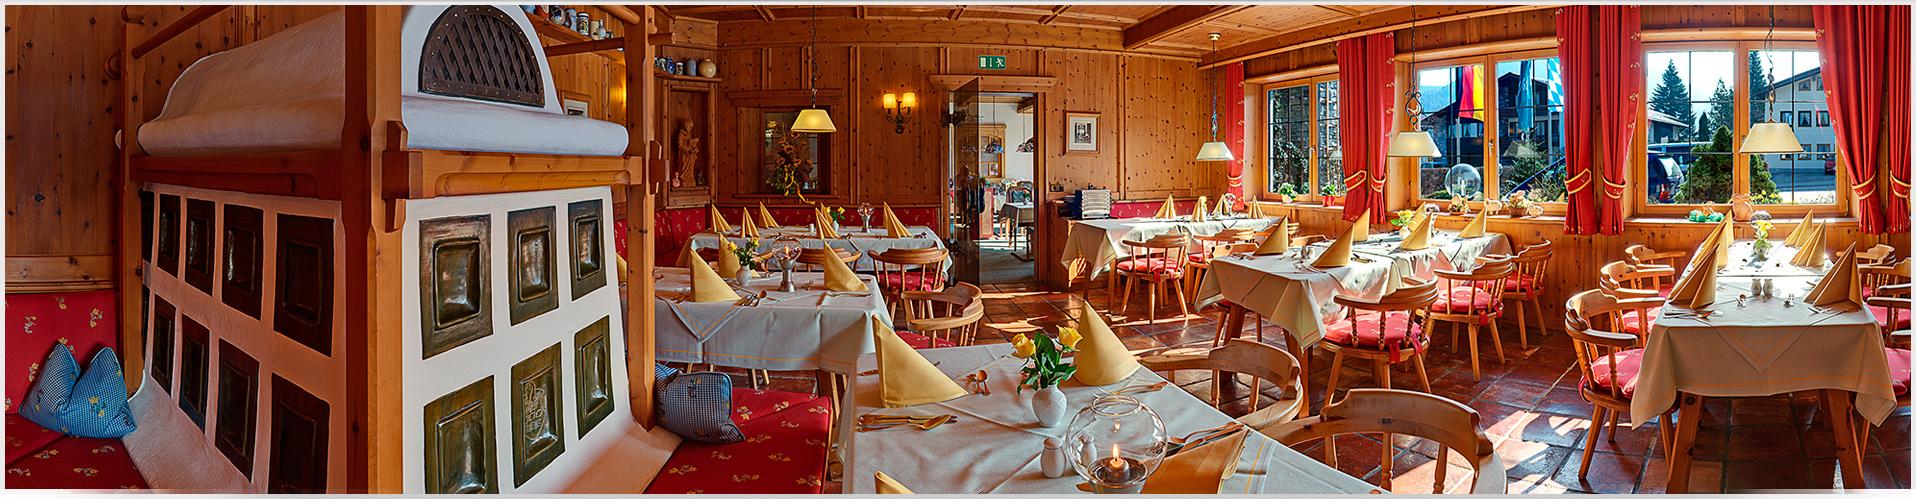 Hotel Chiemsee  Sterne